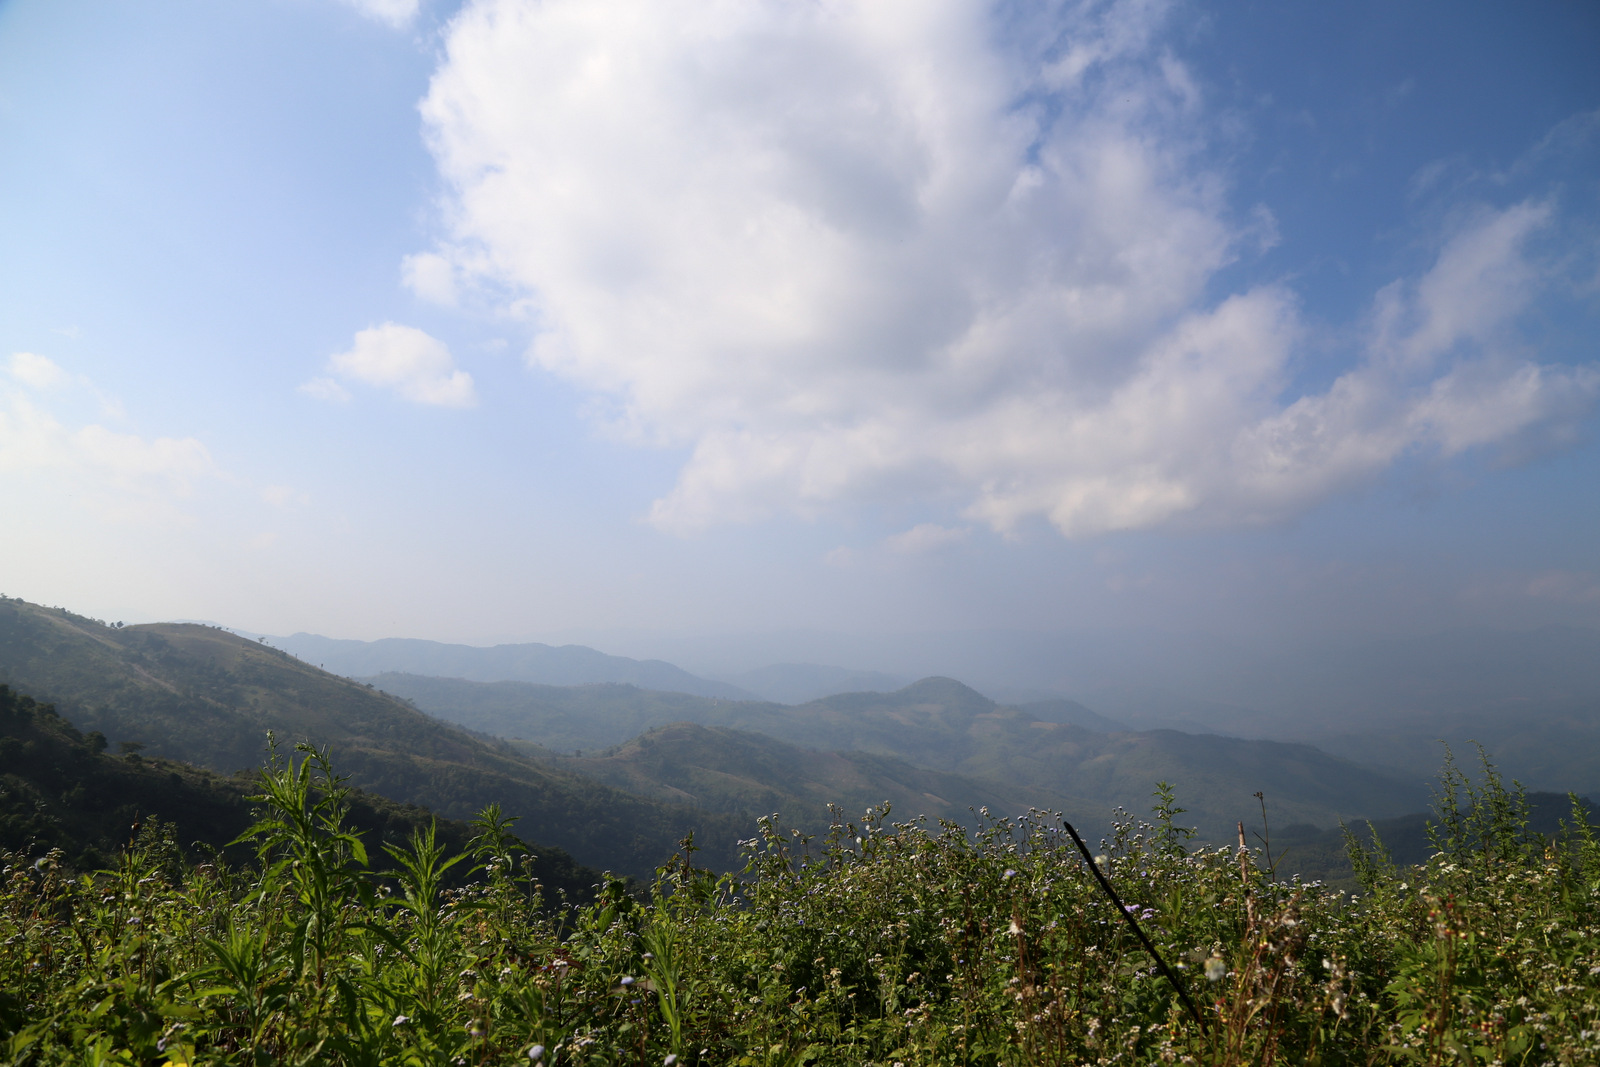 Views across the Myanmar border